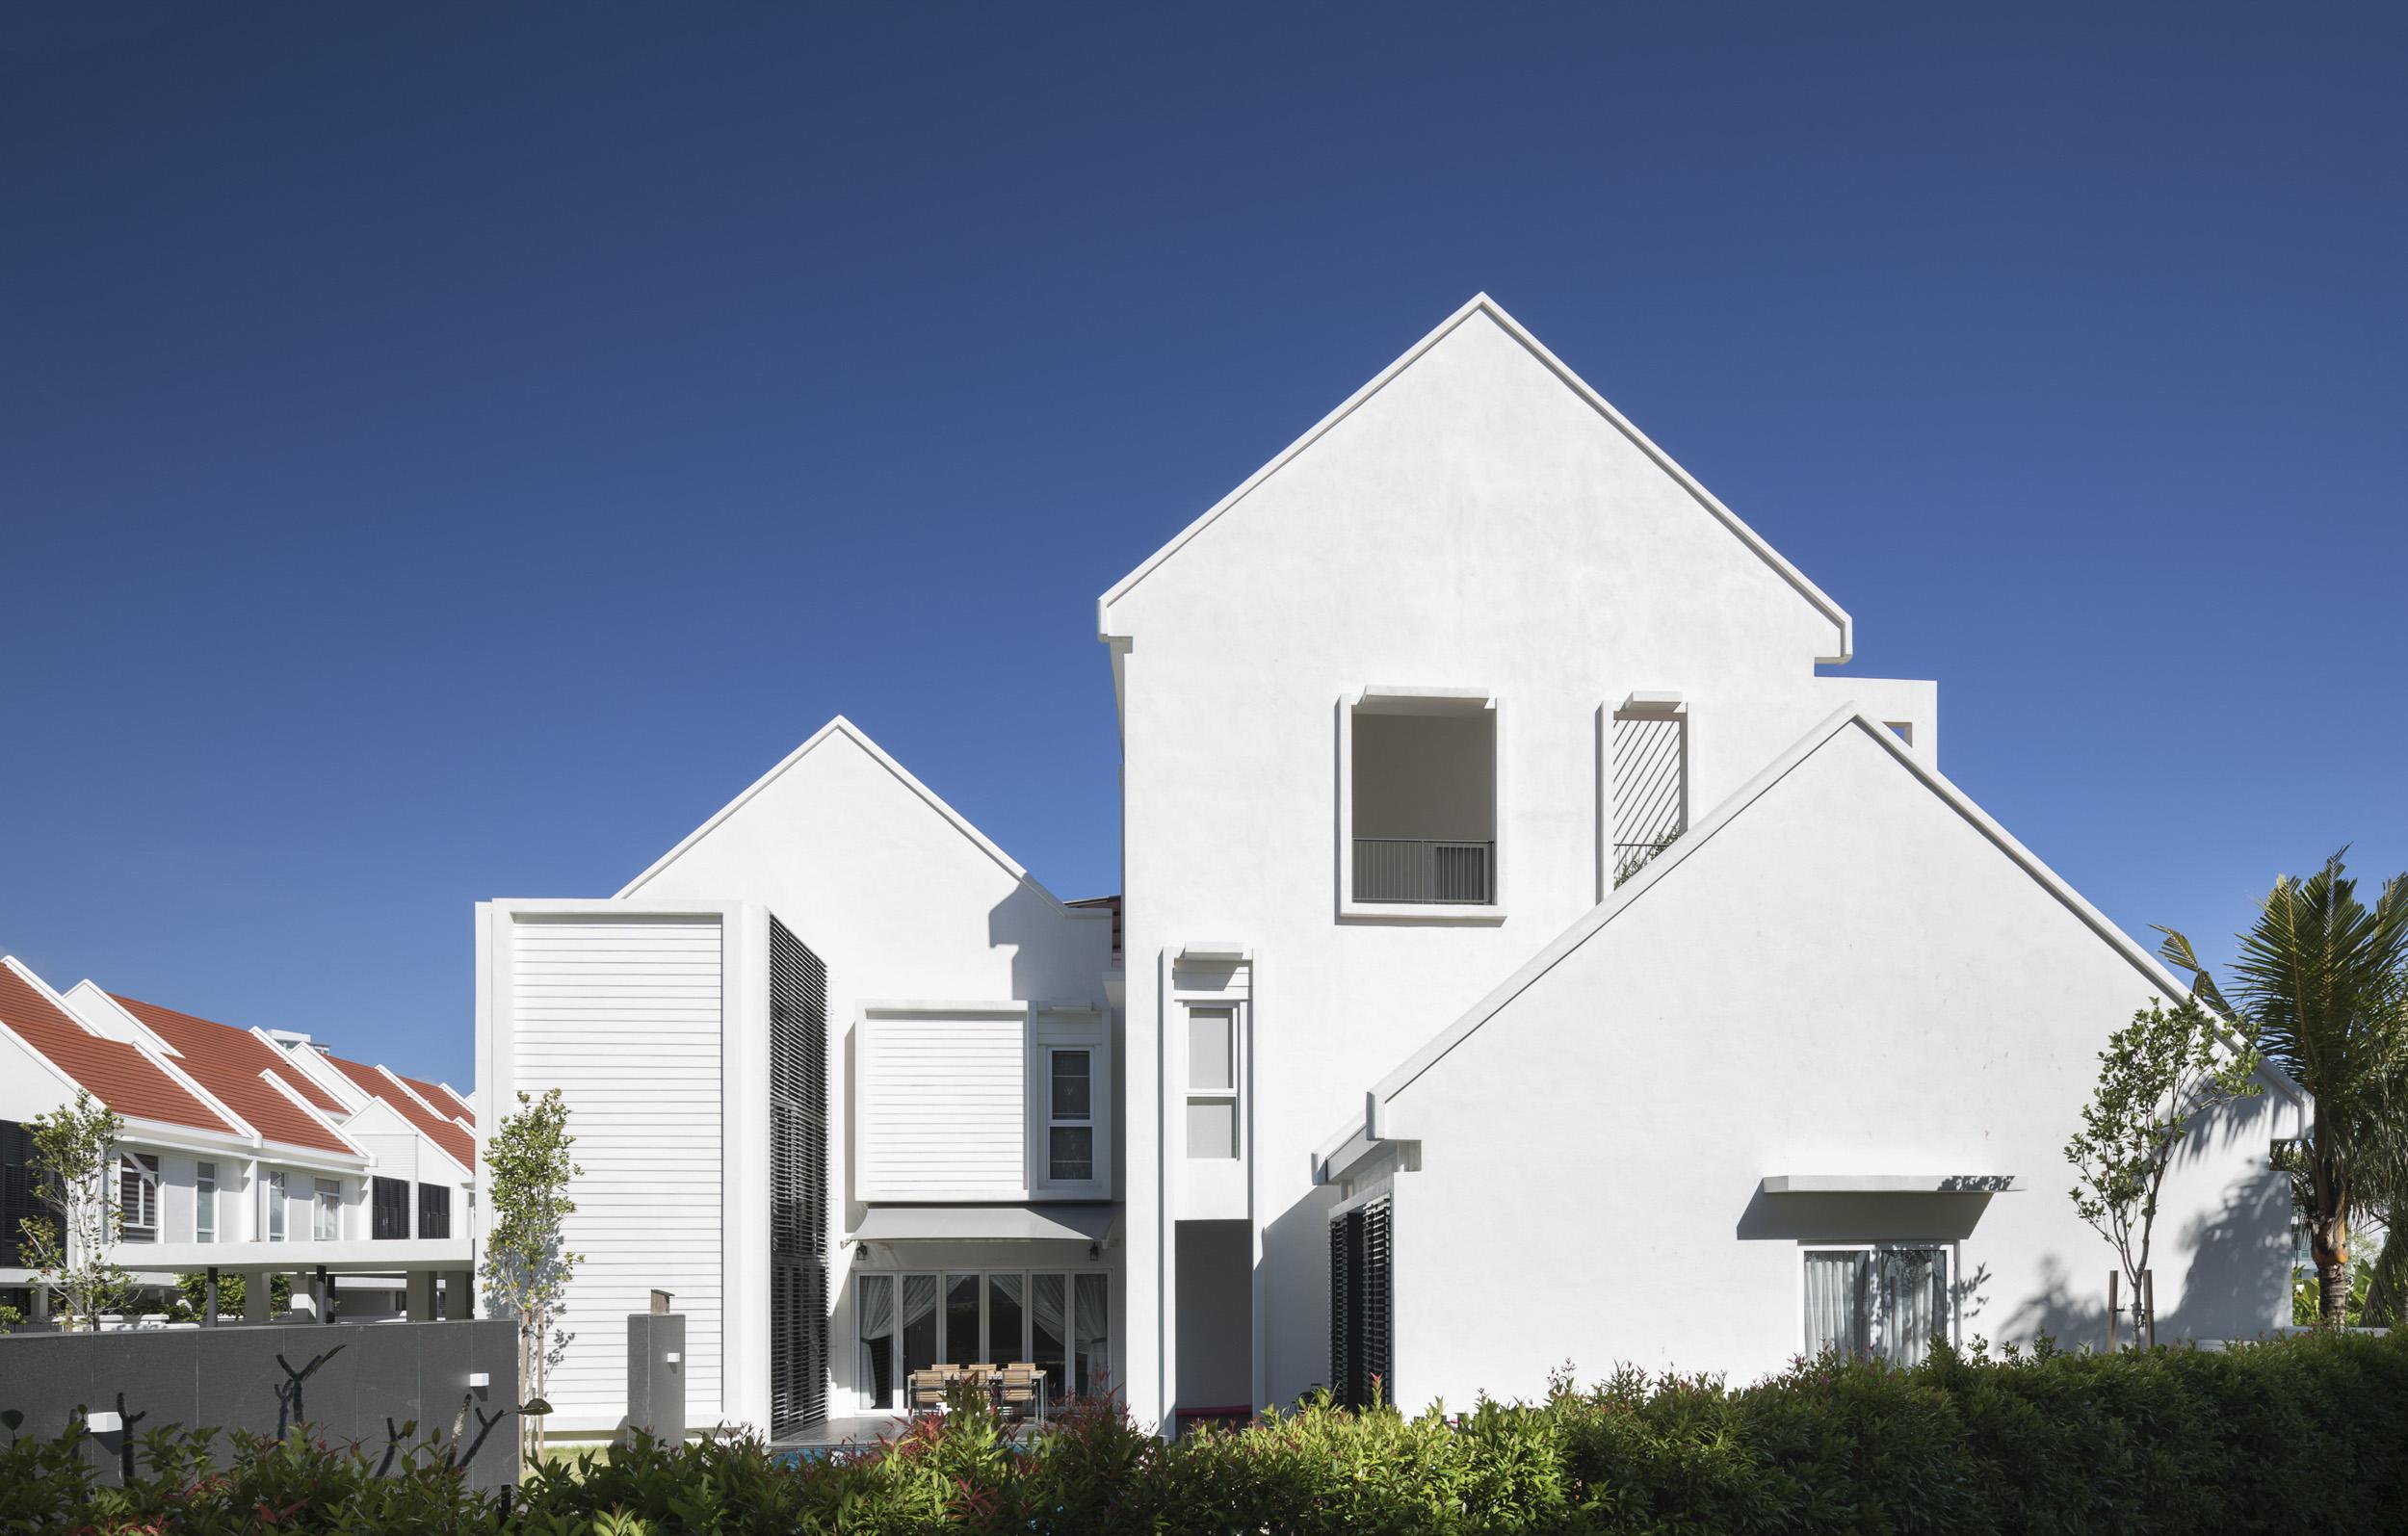 architecture_photography_sydney_australia_91.jpg